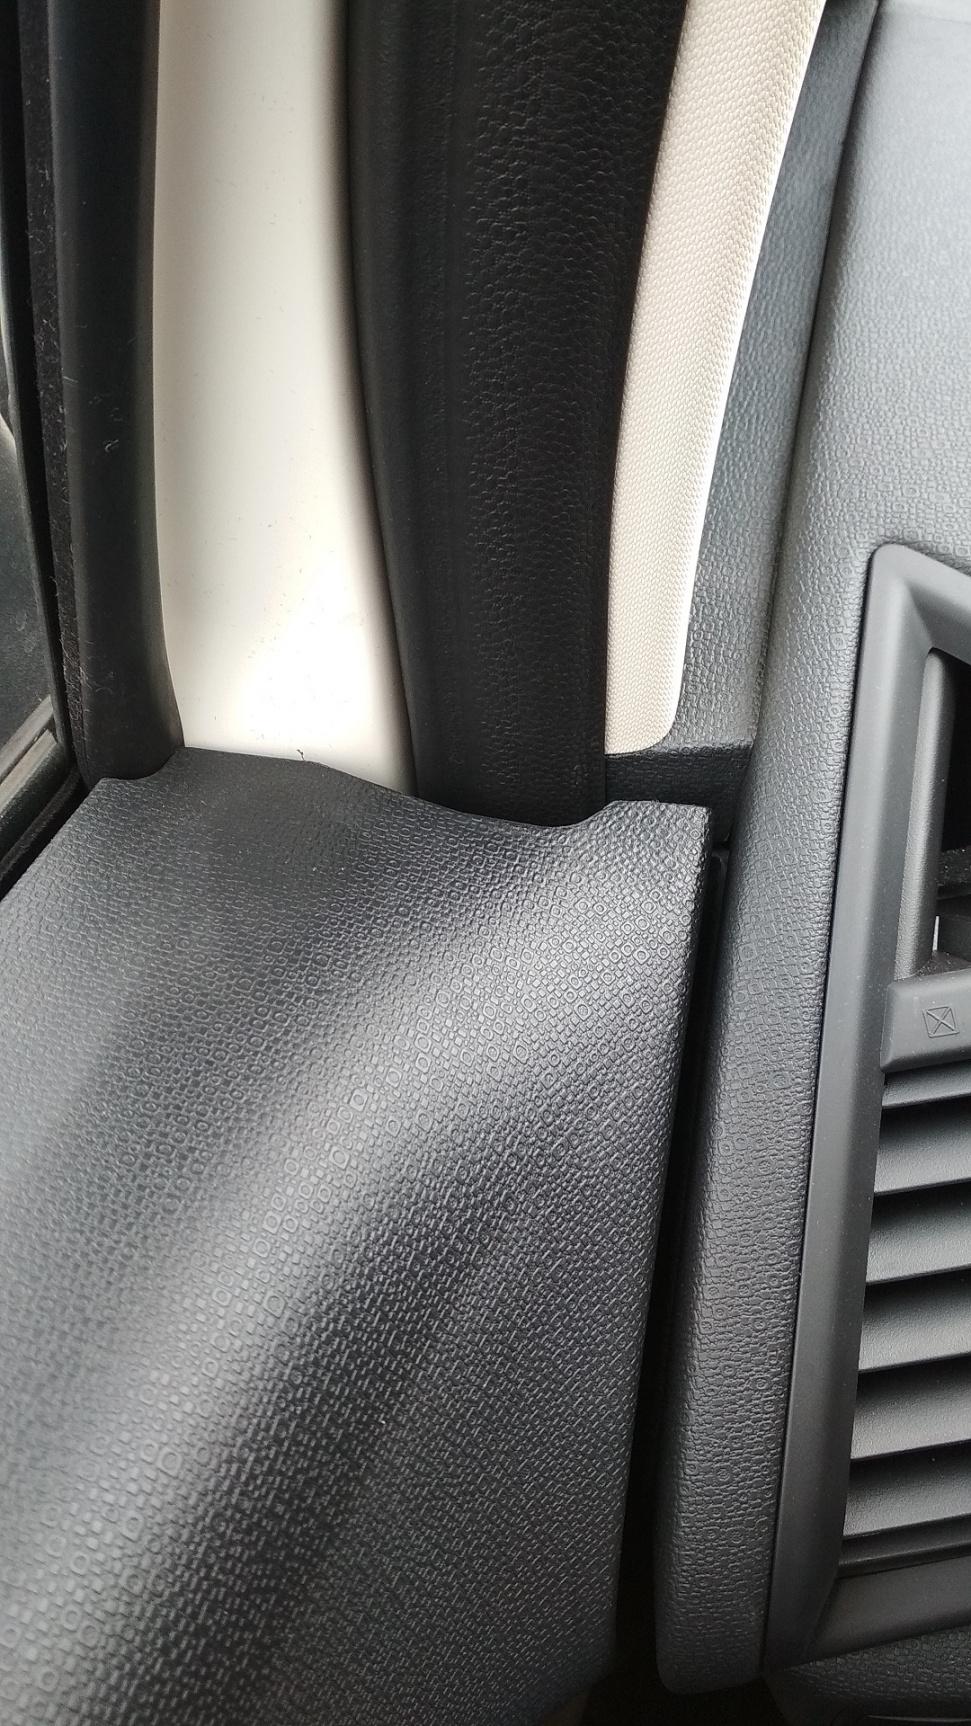 Ford EcoSport?-2019_ford_ecosport-16-.jpg